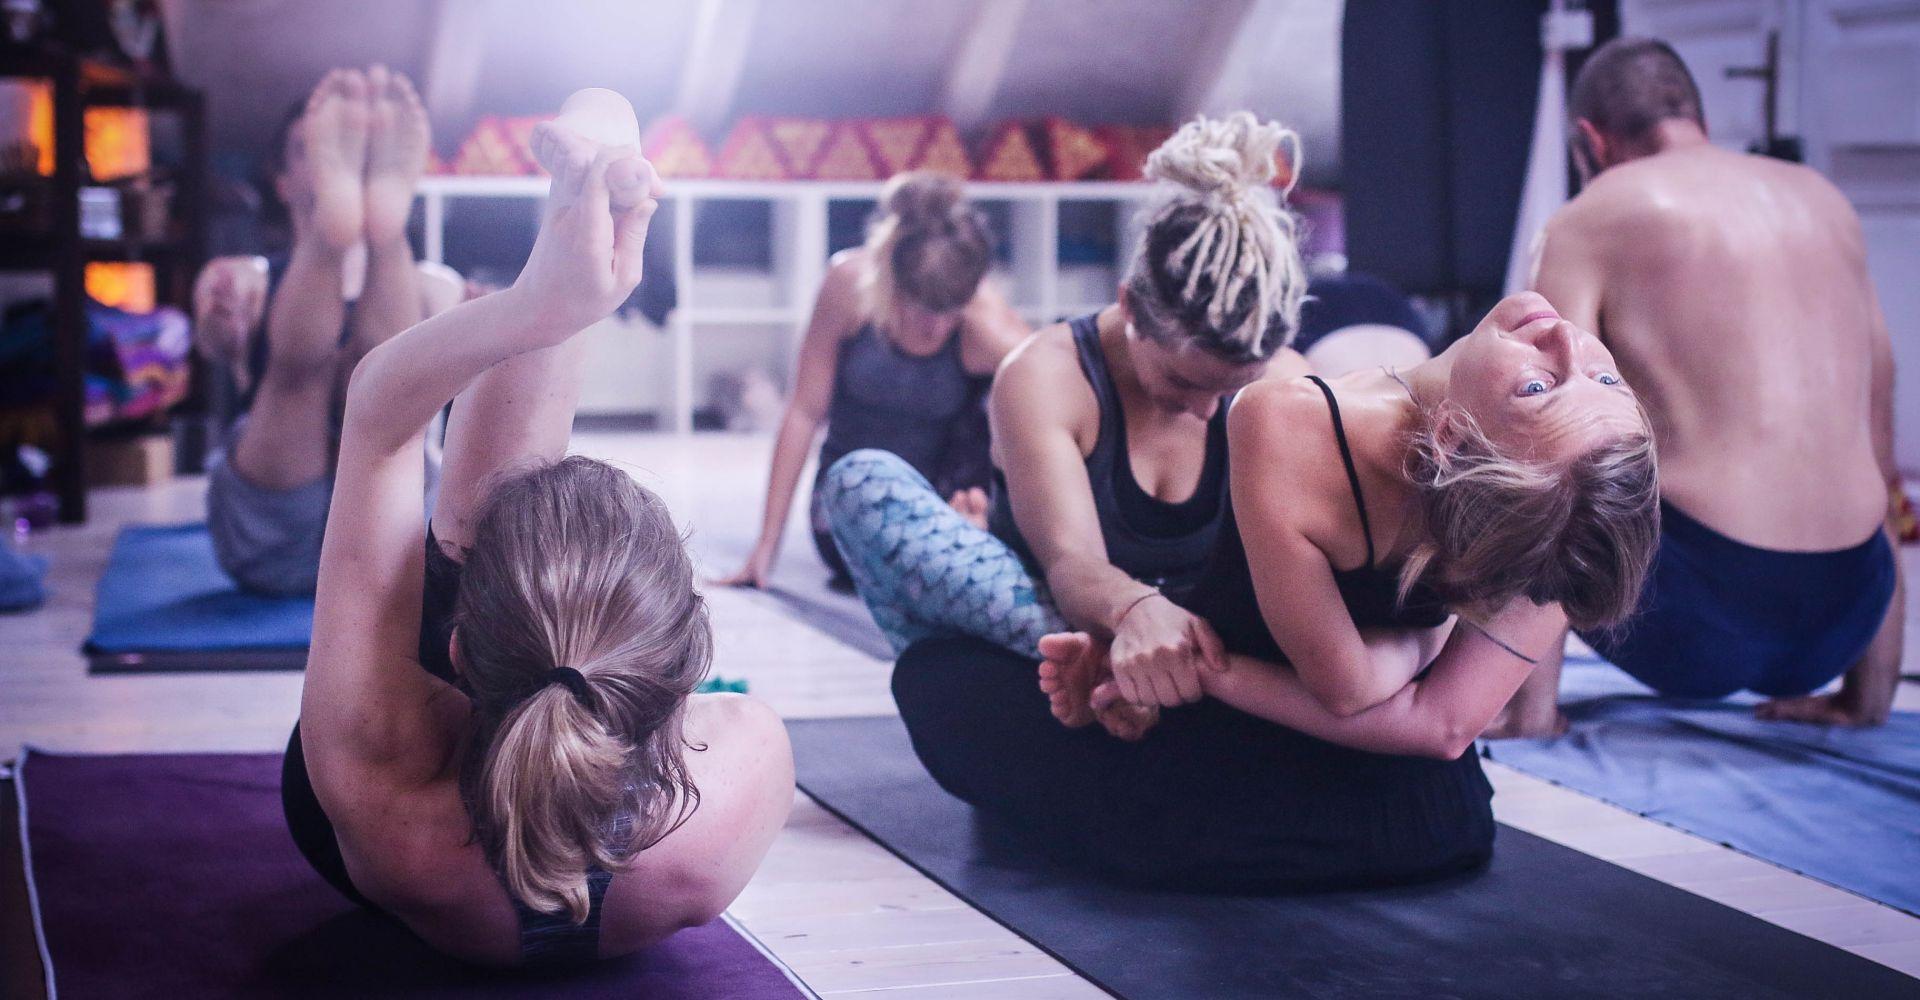 Ekam Inhale - The Ashtanga Vinyasa Count: Learn how to focus